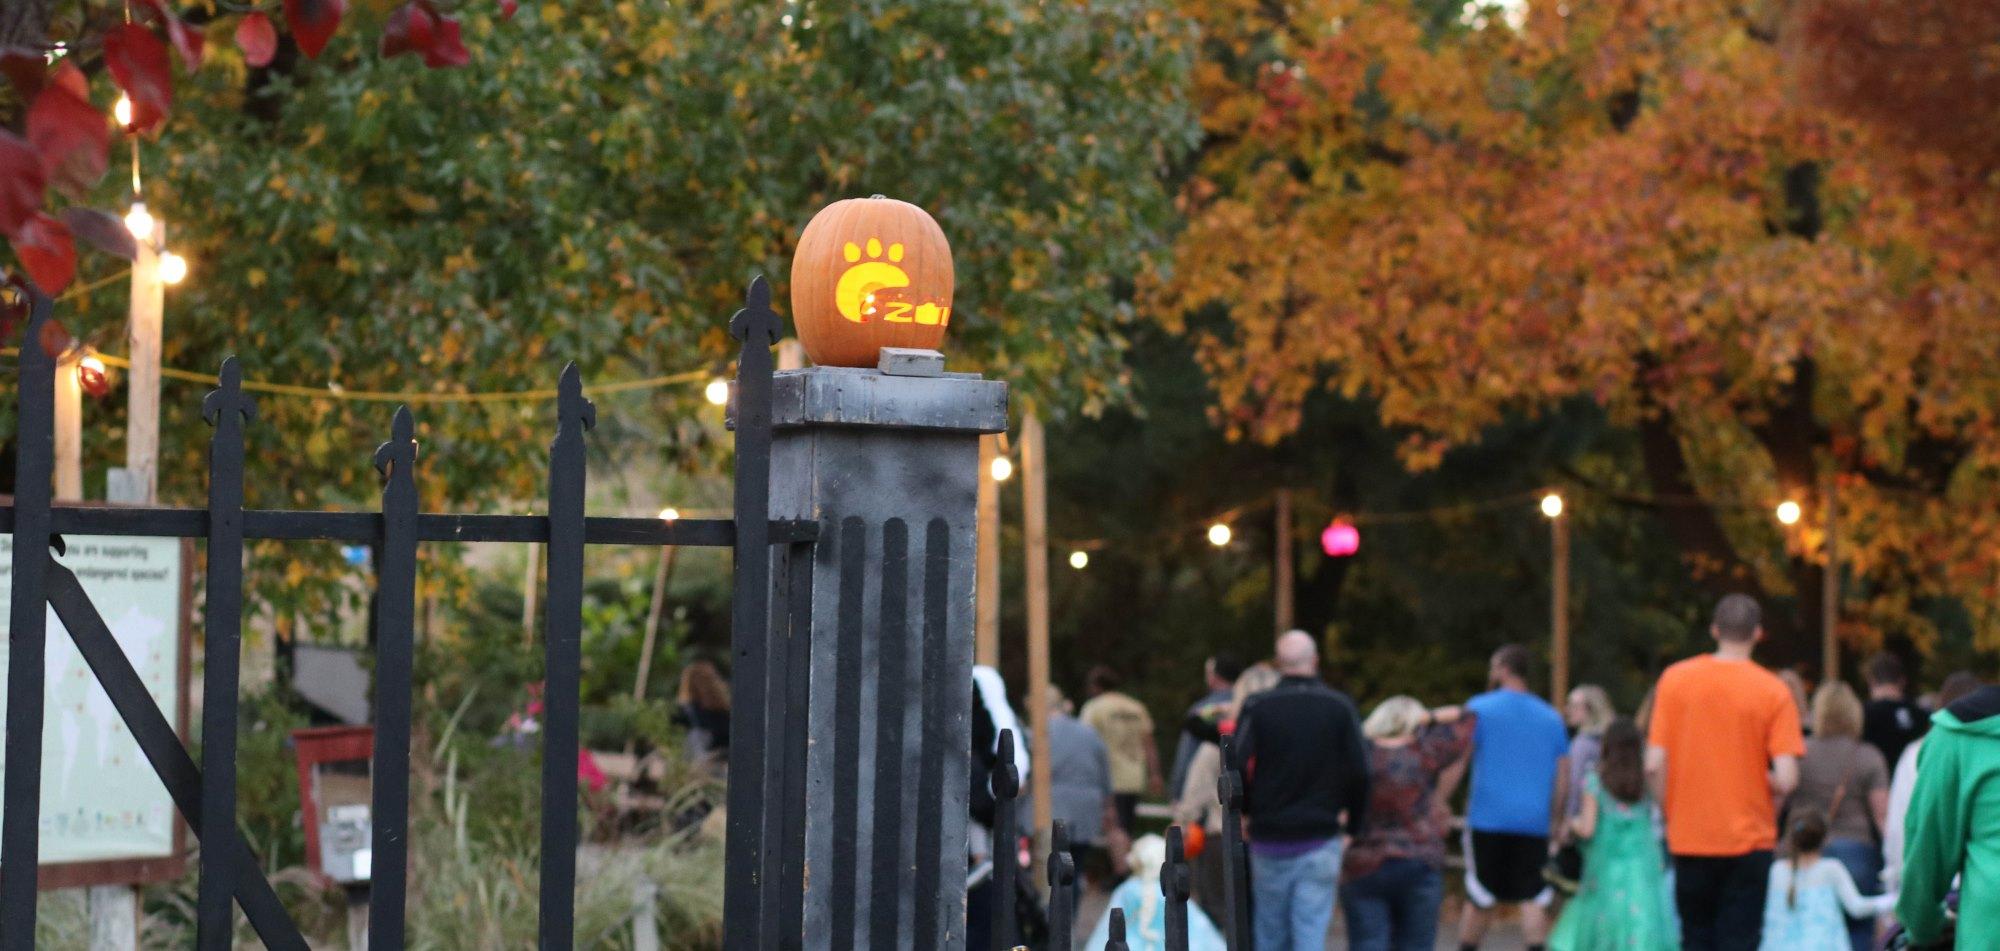 Kansas City Zoo Halloween 2020 Boo At The Zoo Boo at the Zoo – Sedgwick County Zoo